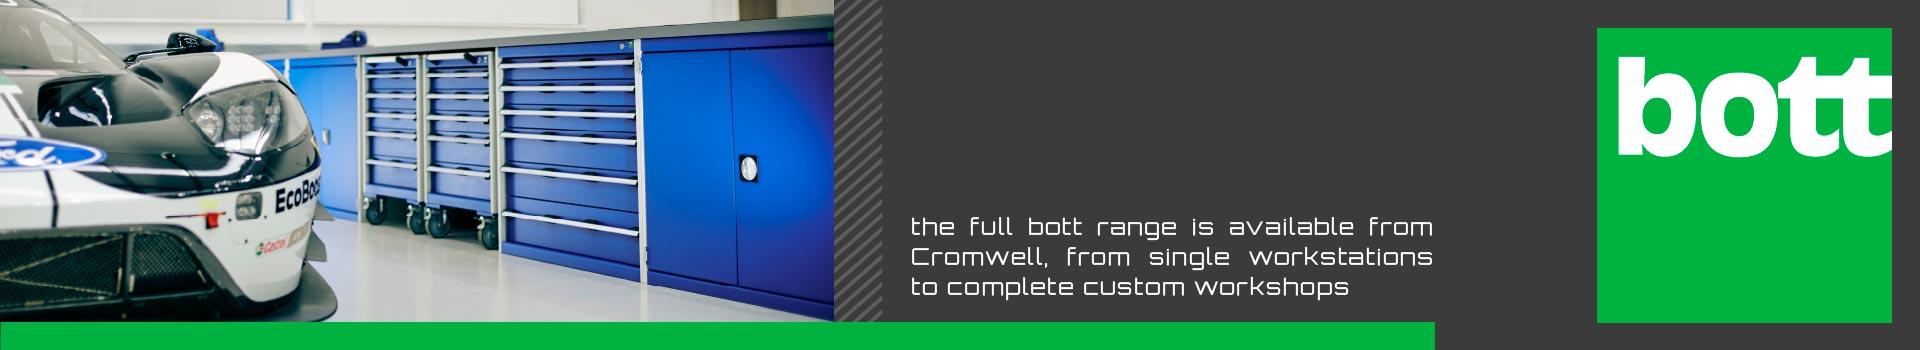 https://static-content.cromwell.co.uk/content/images/brands/bott/banner.jpg